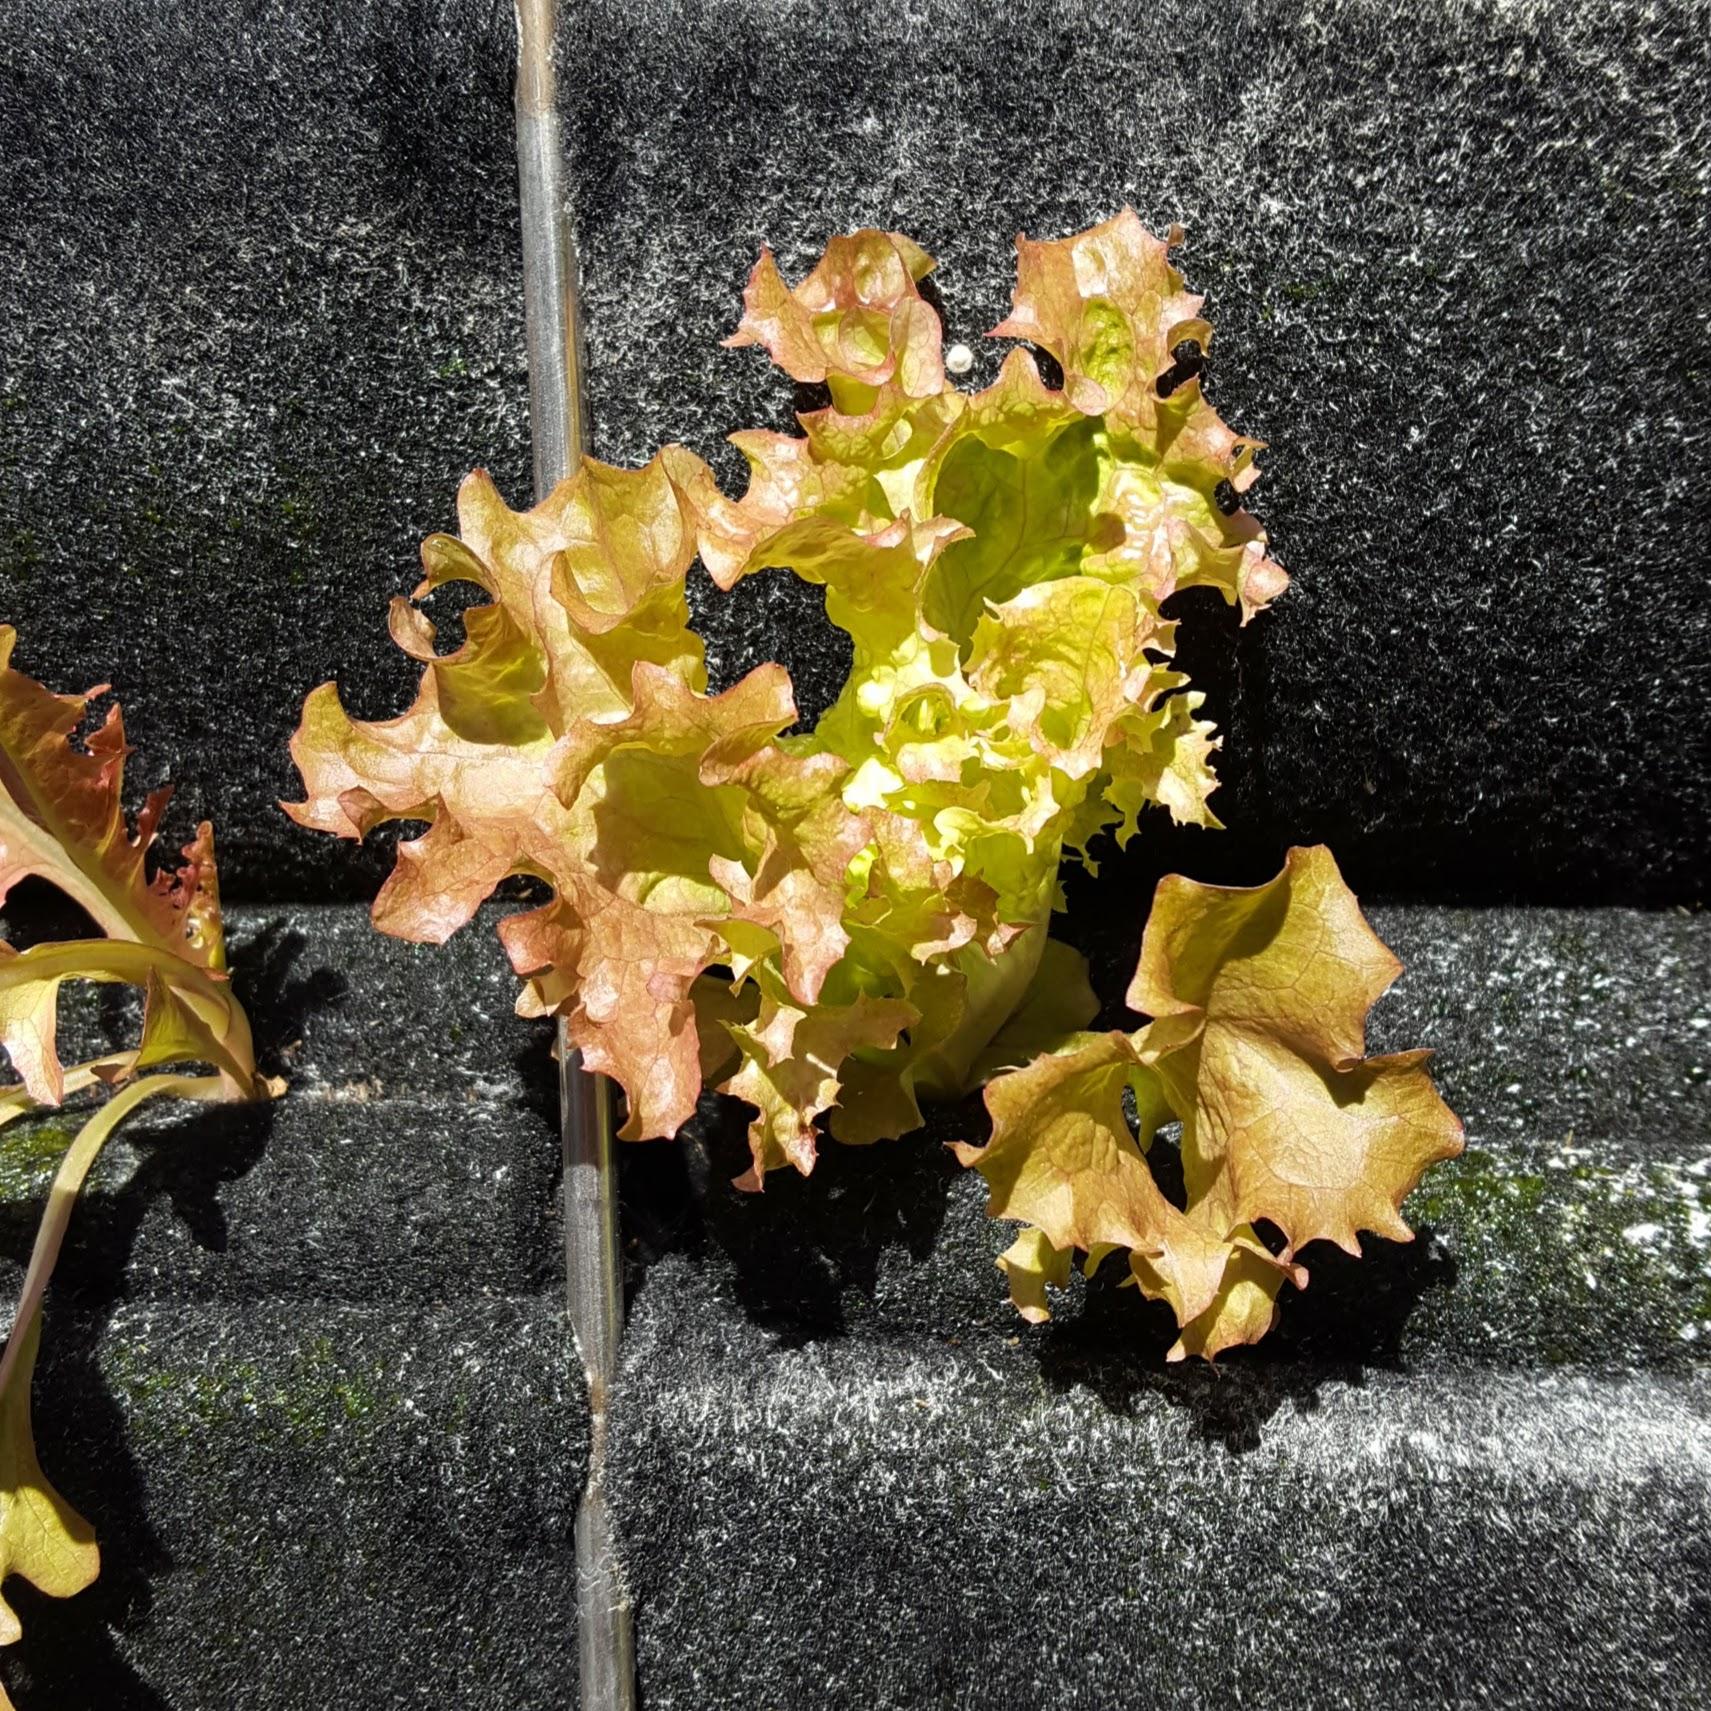 Florafelt Pro System Aquaponics Chris Bribach Sonoma California 18.jpg